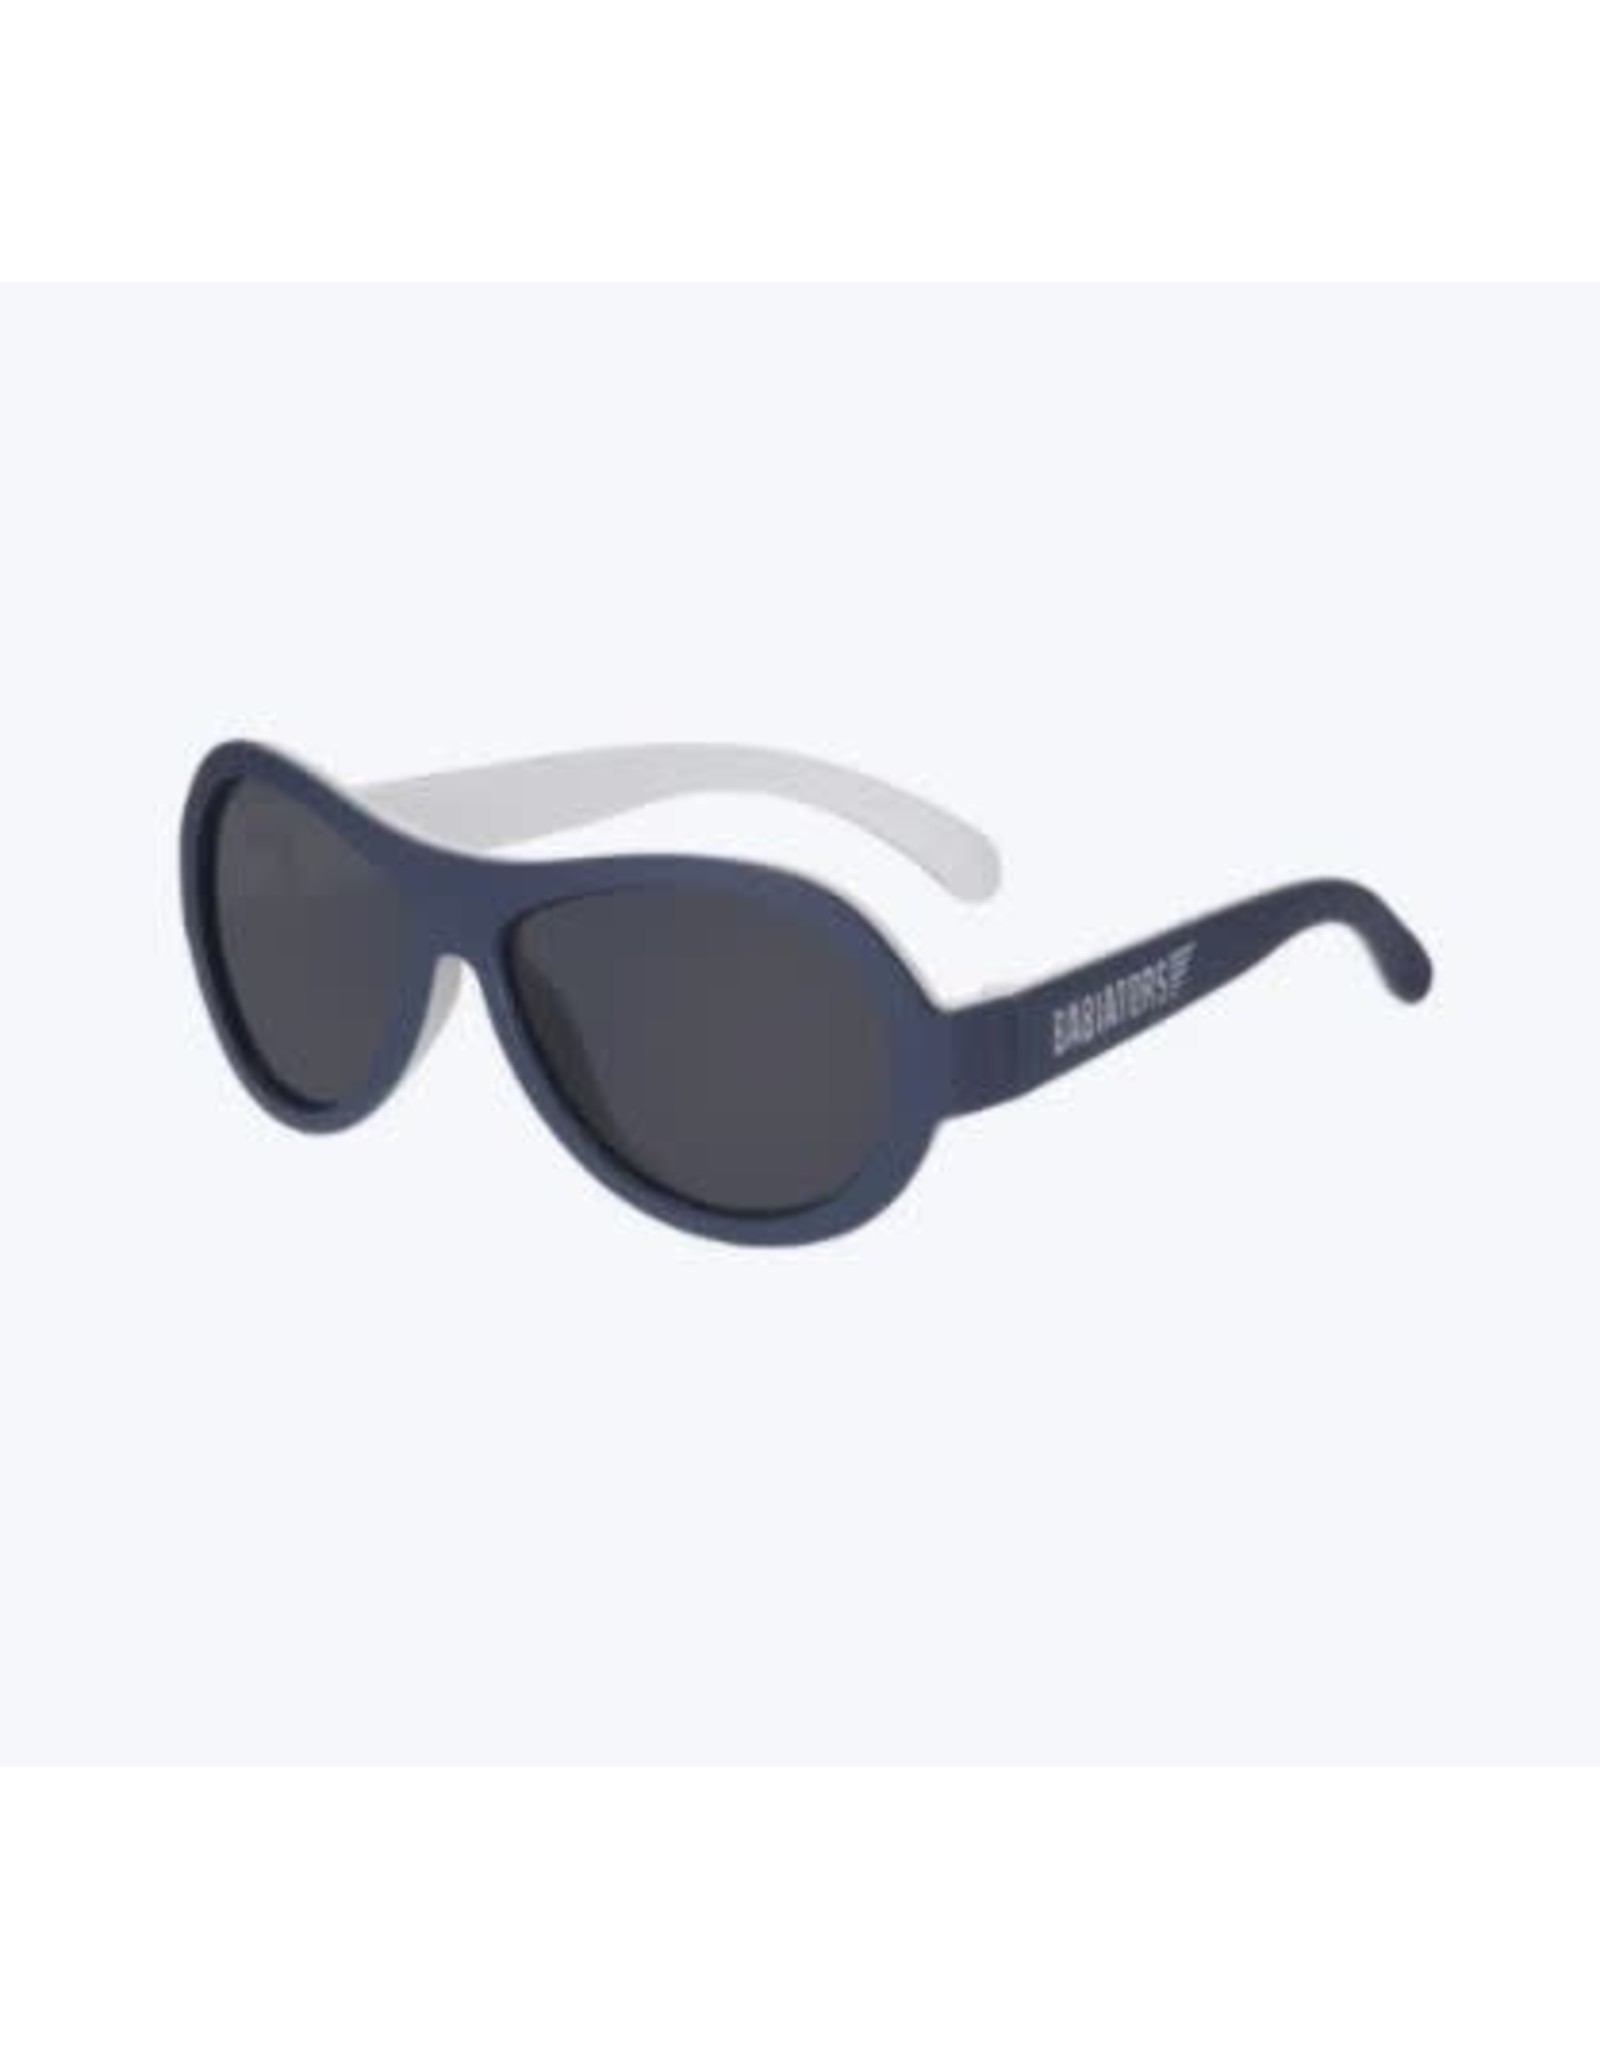 "Babiators ""Nautical Navy Two-Tone Aviators"" Sunglasses"